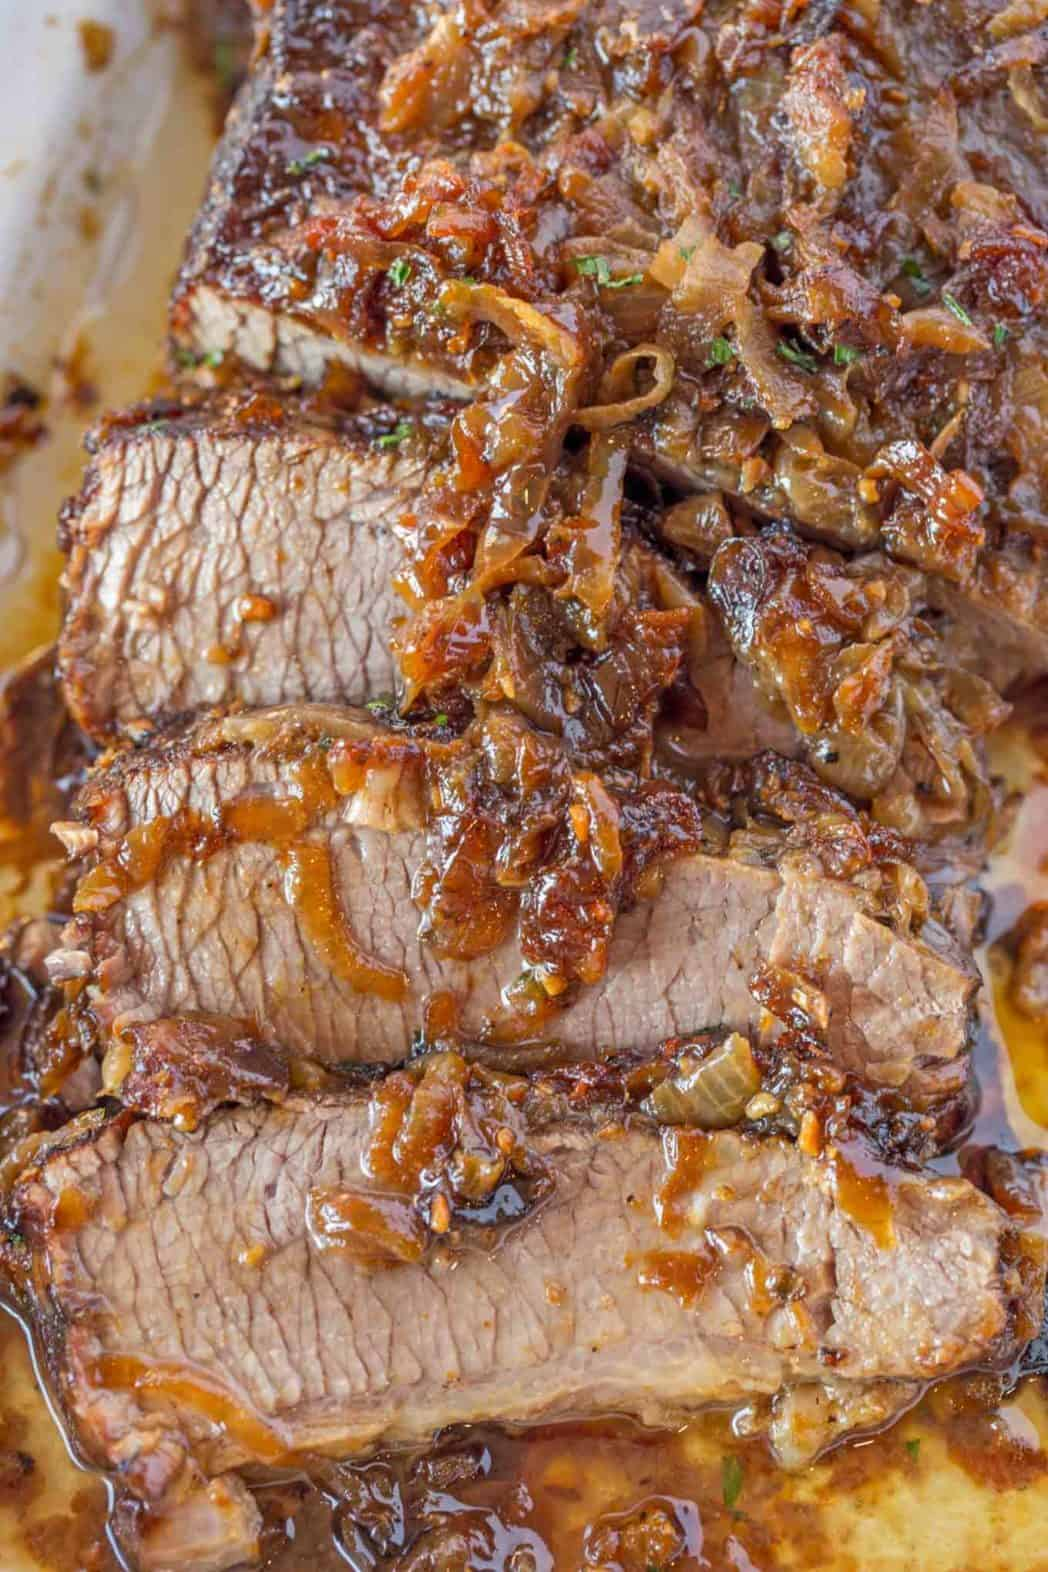 How to cook beef brisket in oven